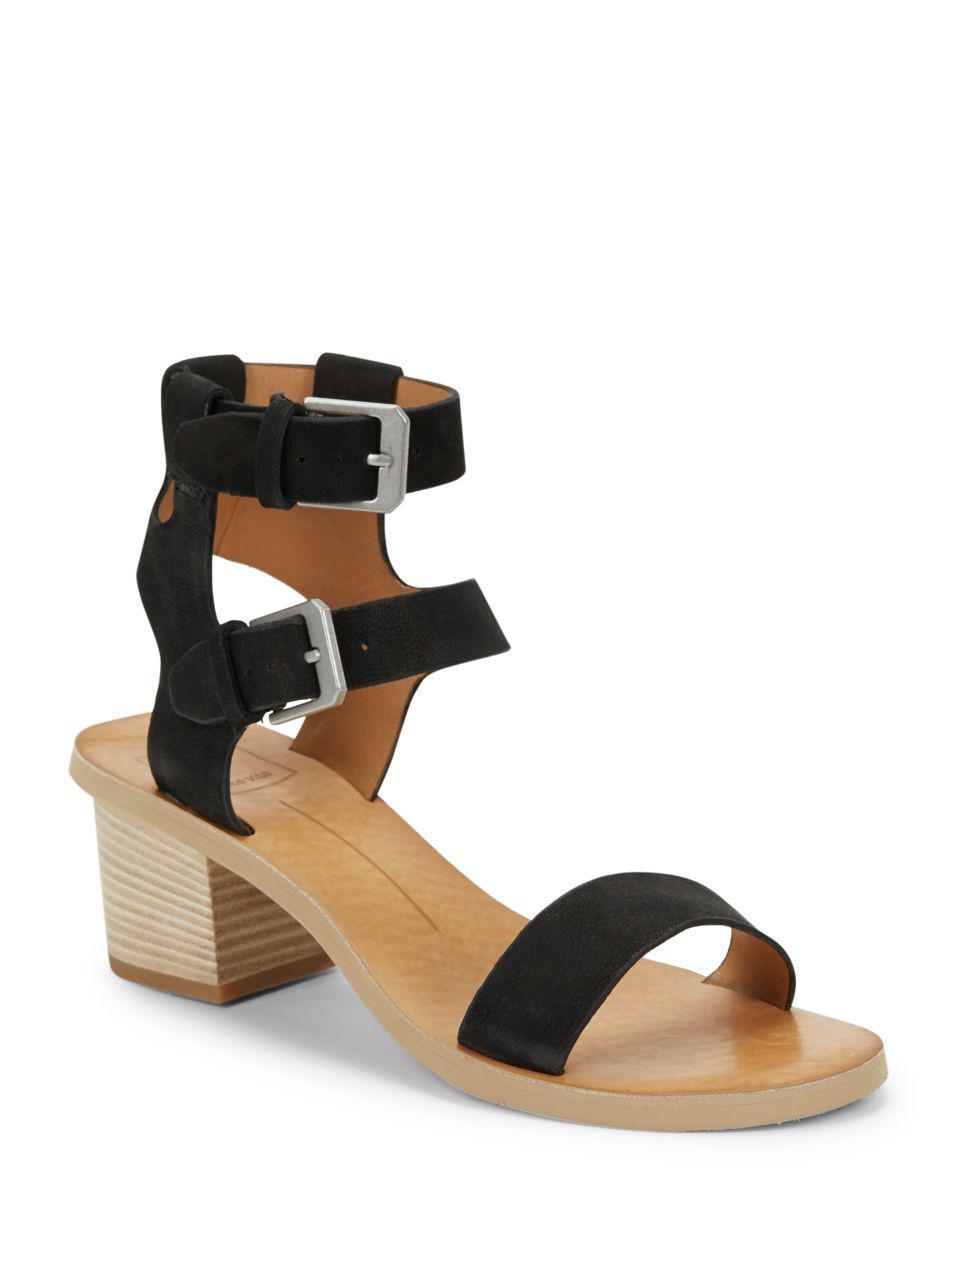 7615658385d Dolce Vita West Suede Block Heel Sandals in Black - Lyst